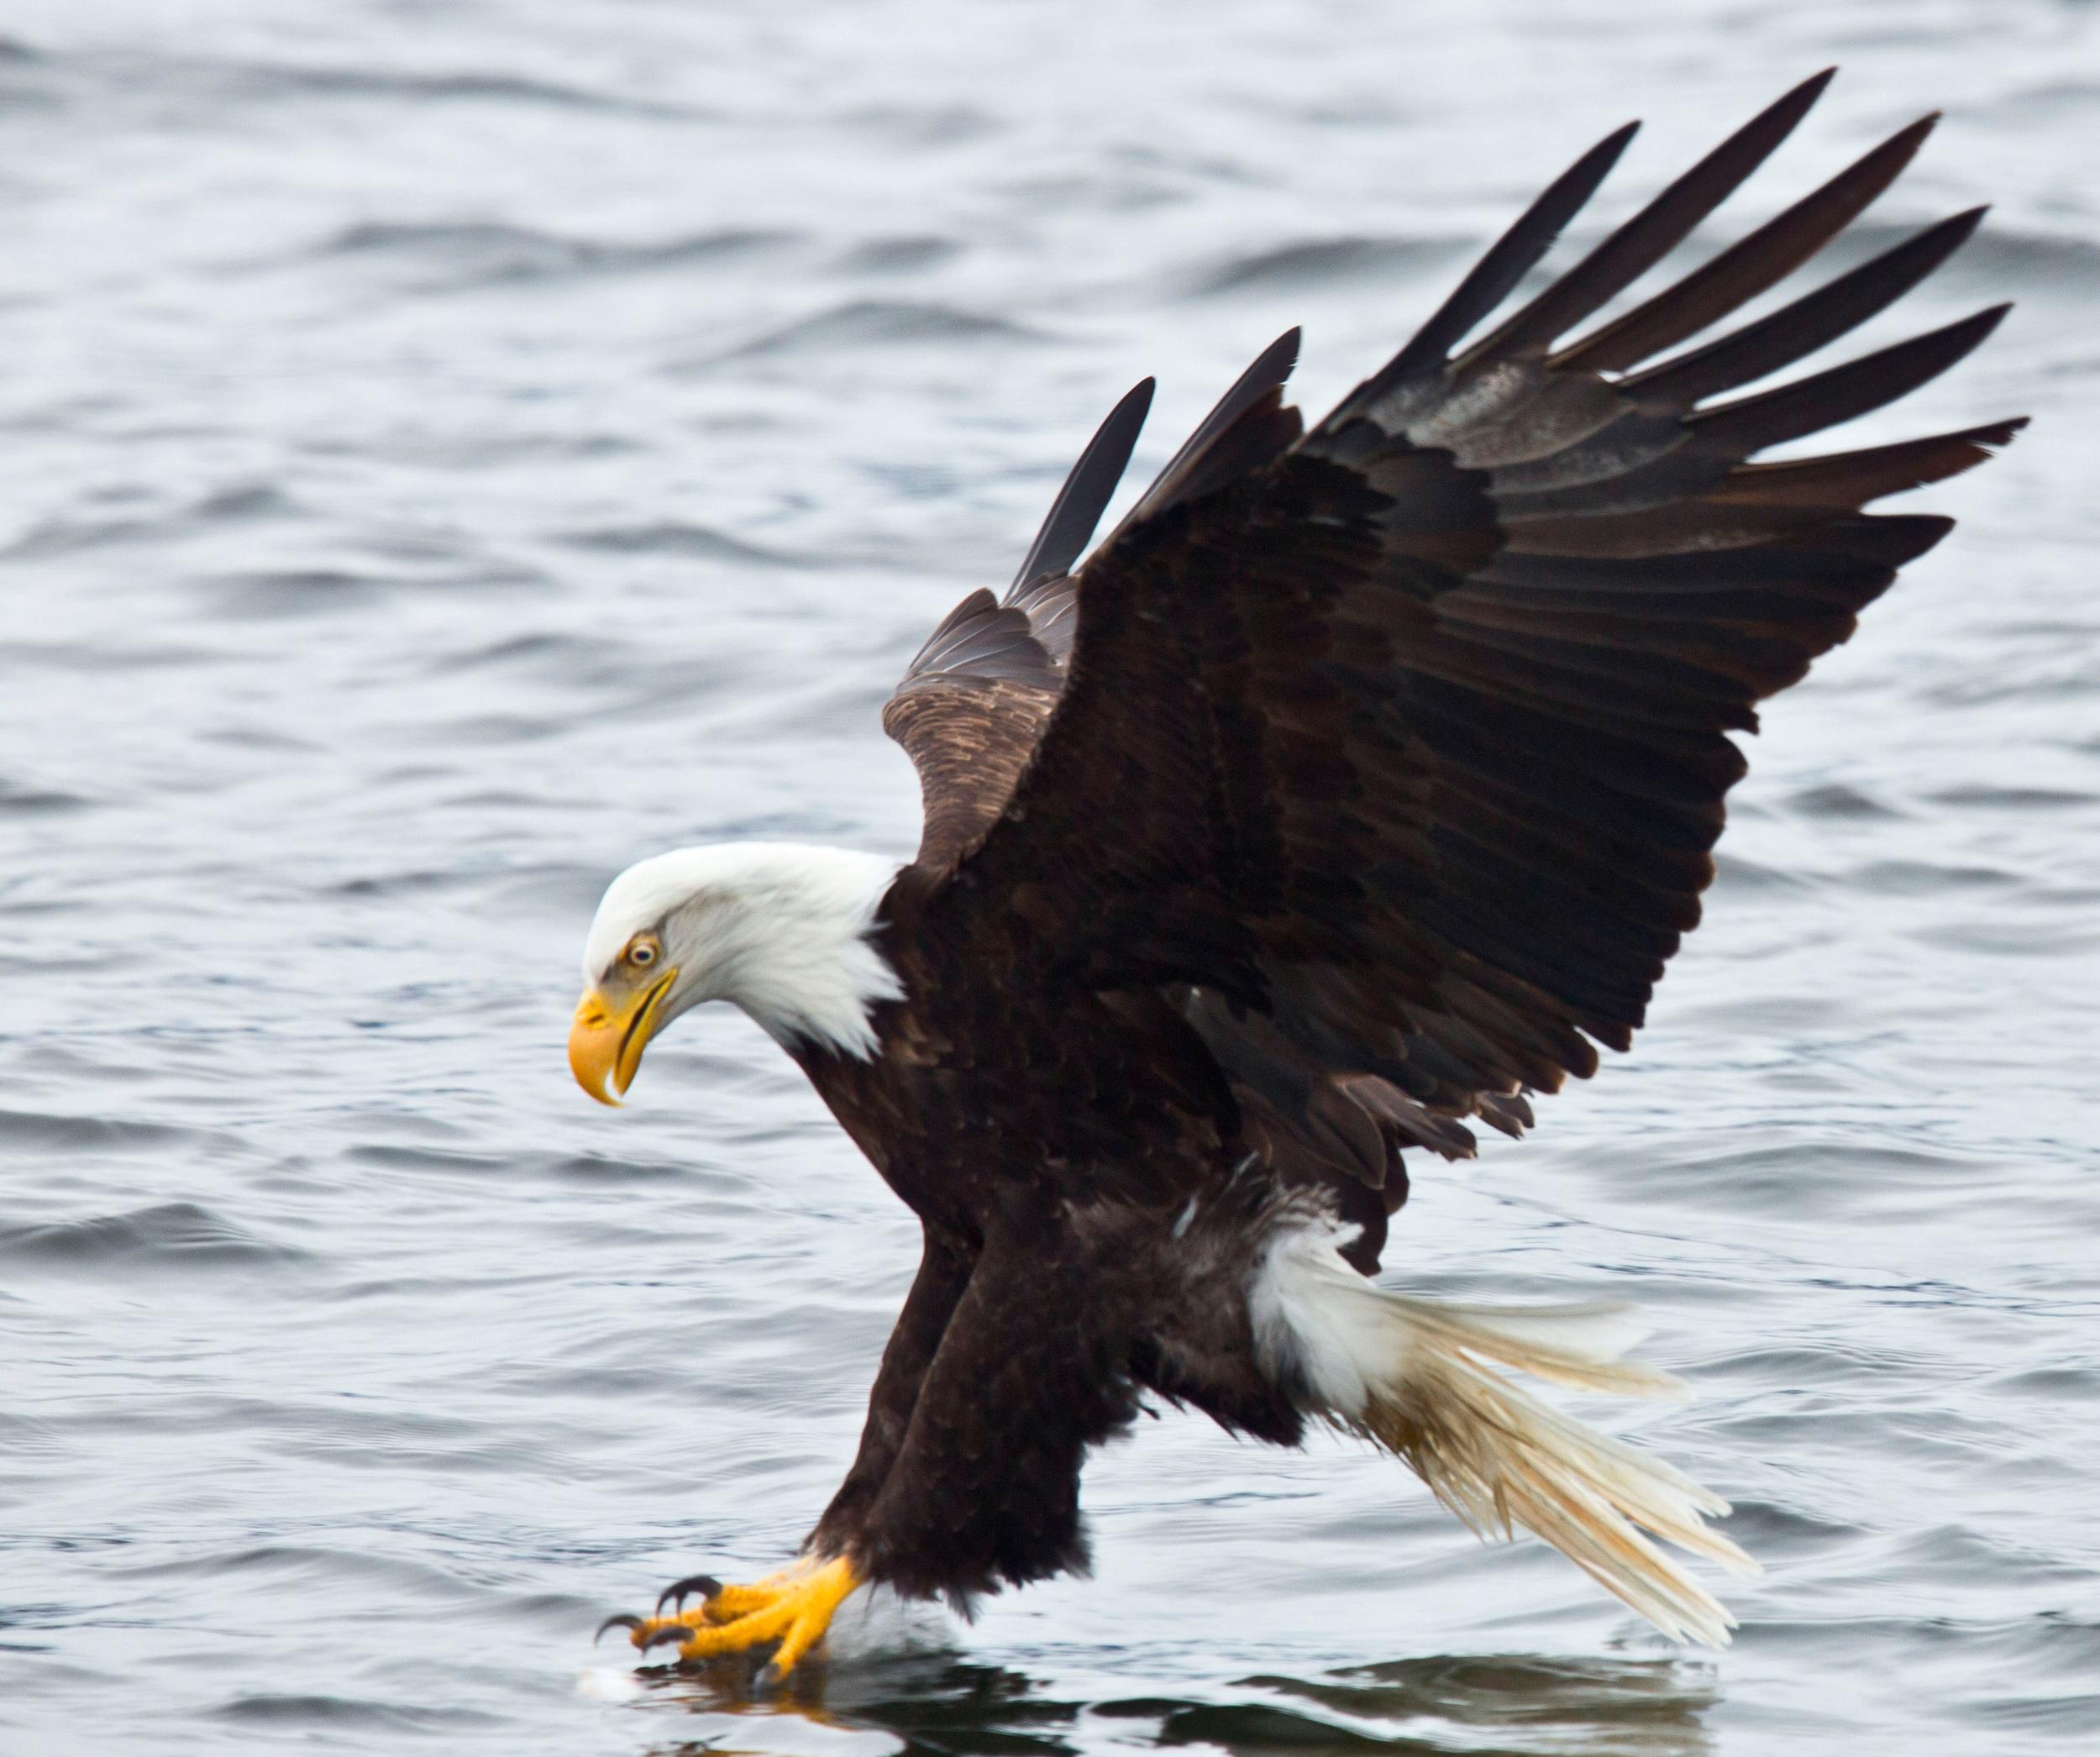 Rick Sammon's Birds036.jpg